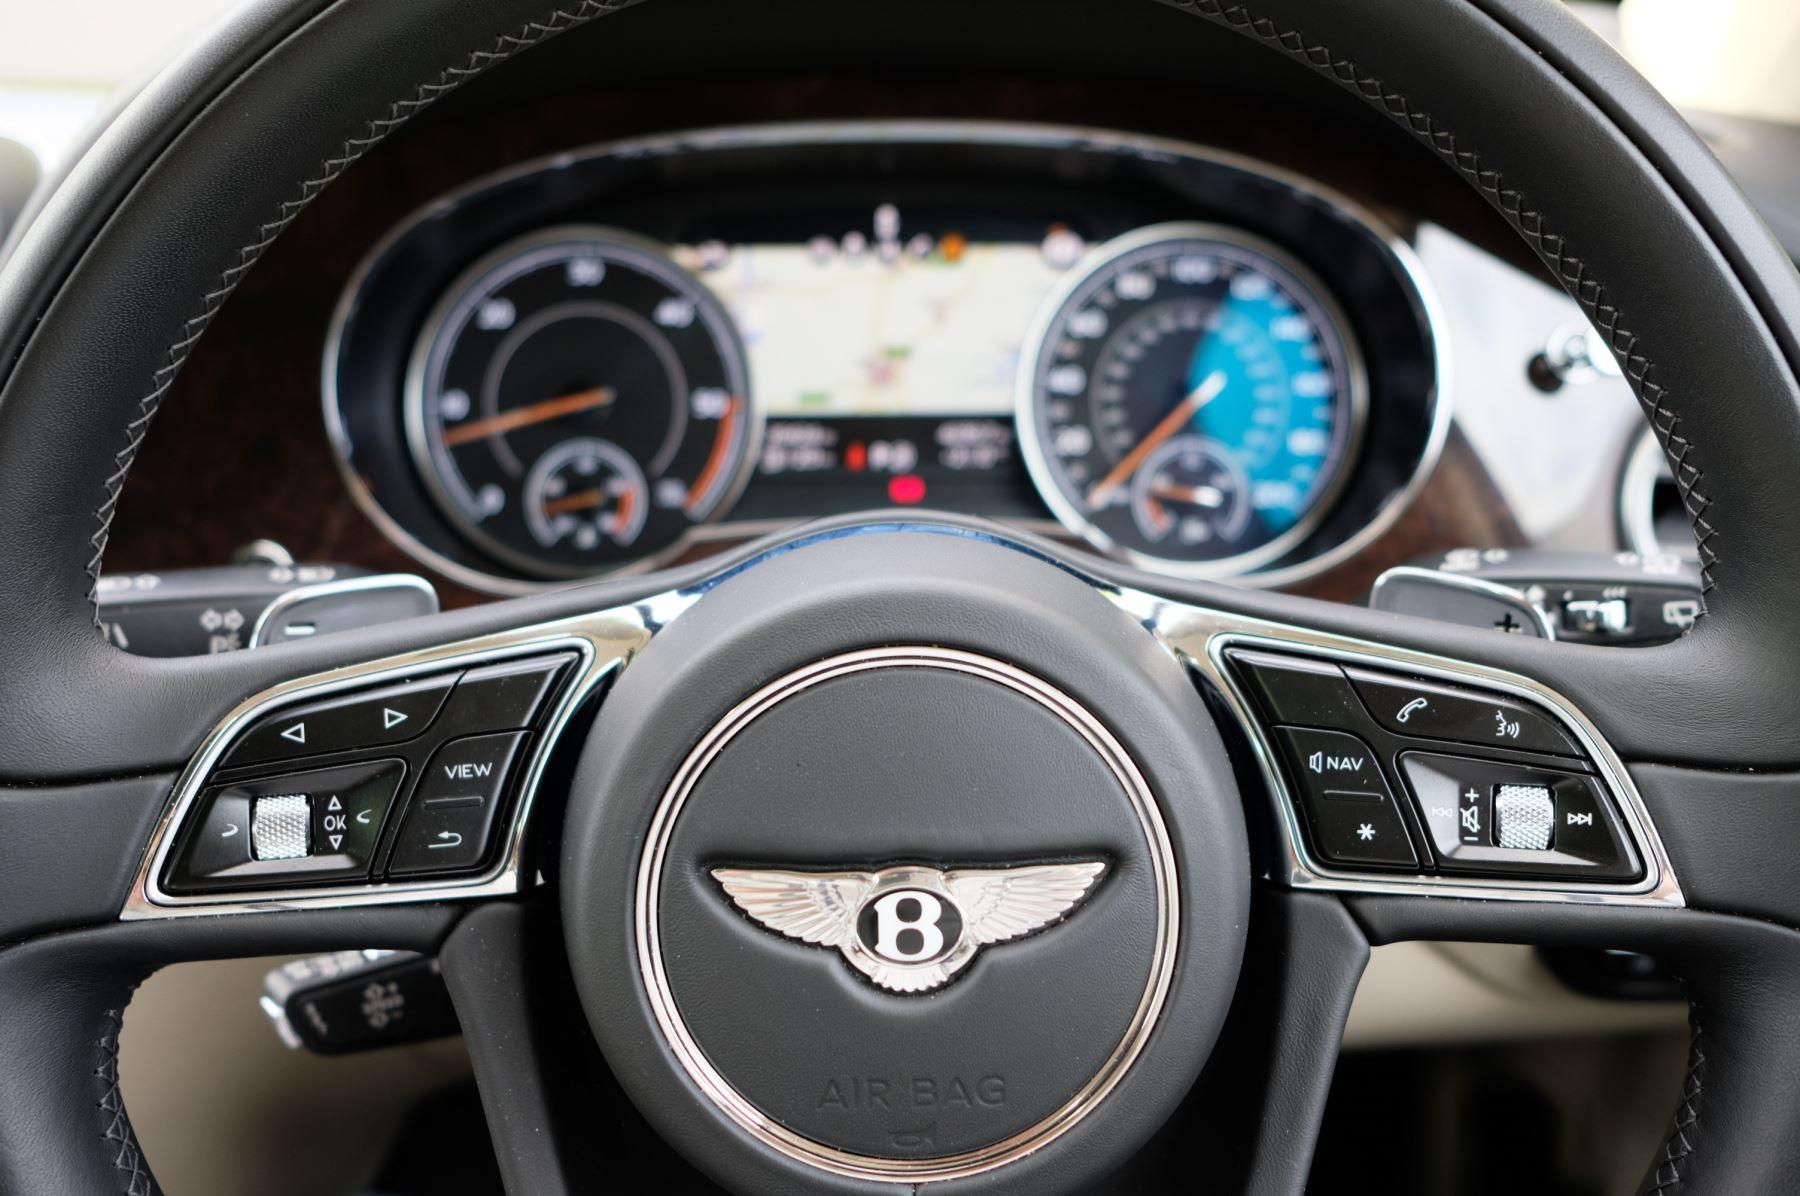 Bentley Bentayga 4.0 V8 5dr - Mulliner Driving Specification - City & Tour Specification image 16